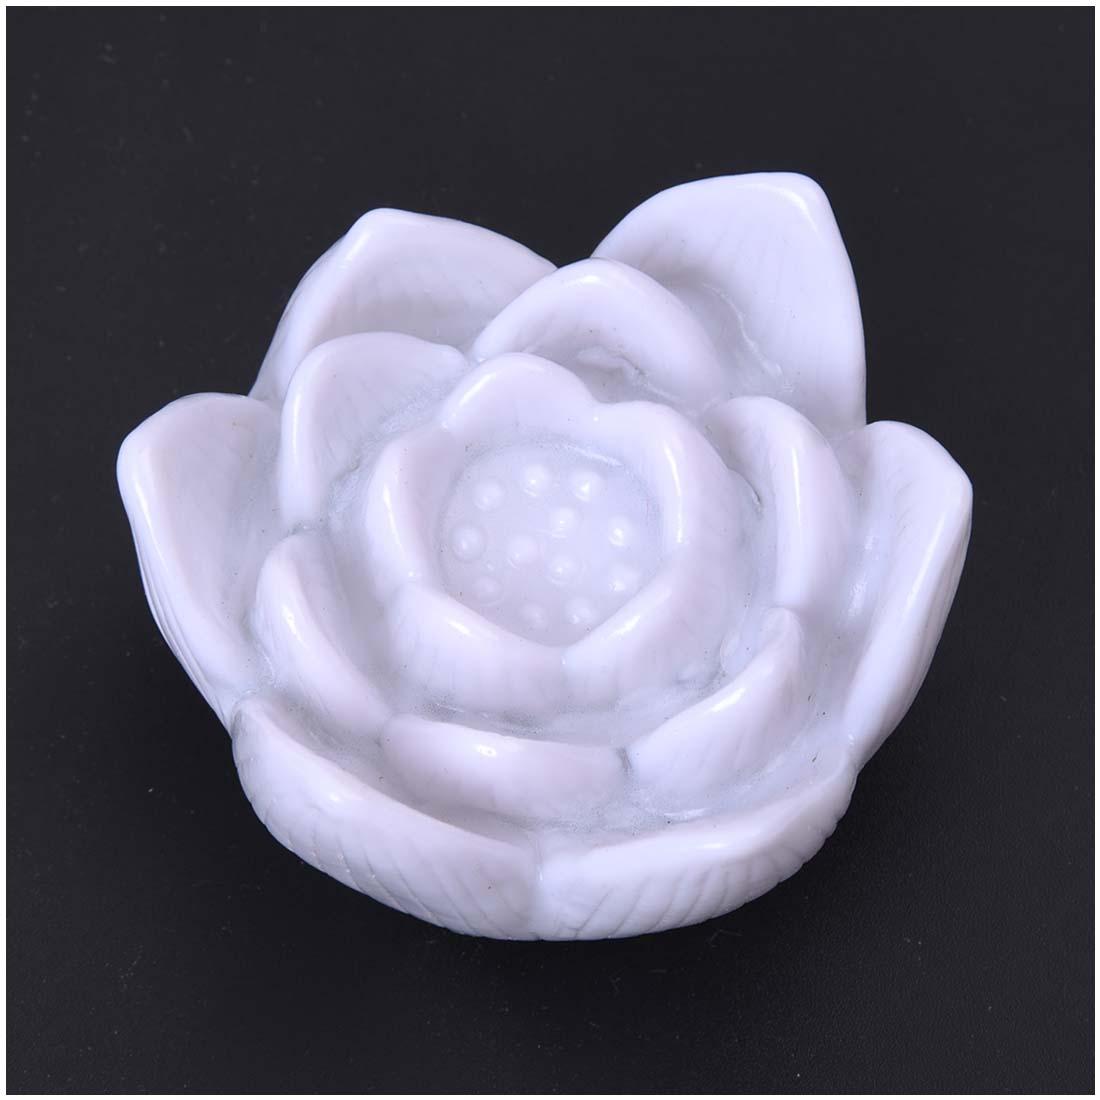 Led Lotus Flower Romantic Love Mood Lamp Night Light Wedding Favor